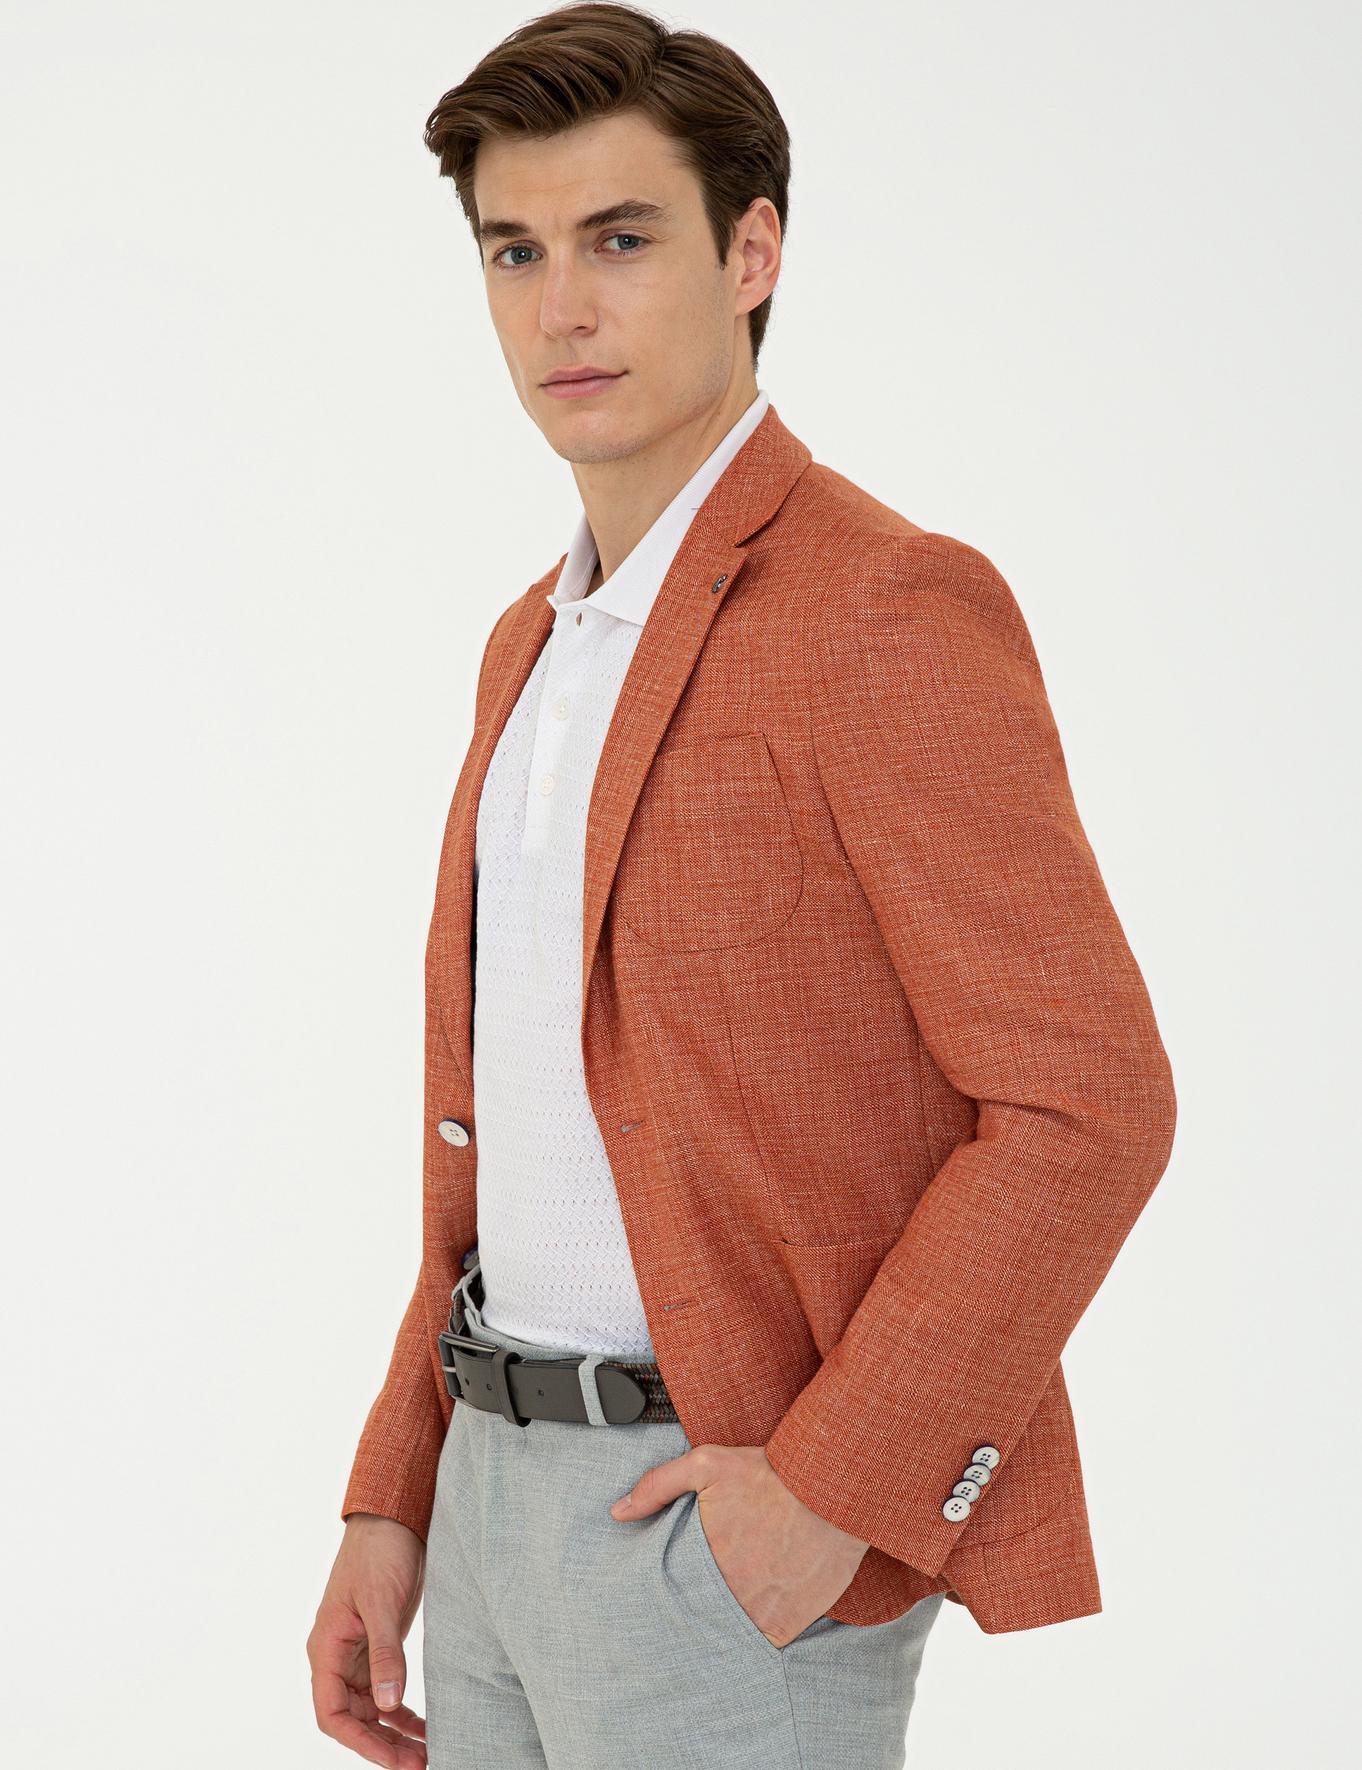 Turuncu Slim Fit Ceket - 50233107077